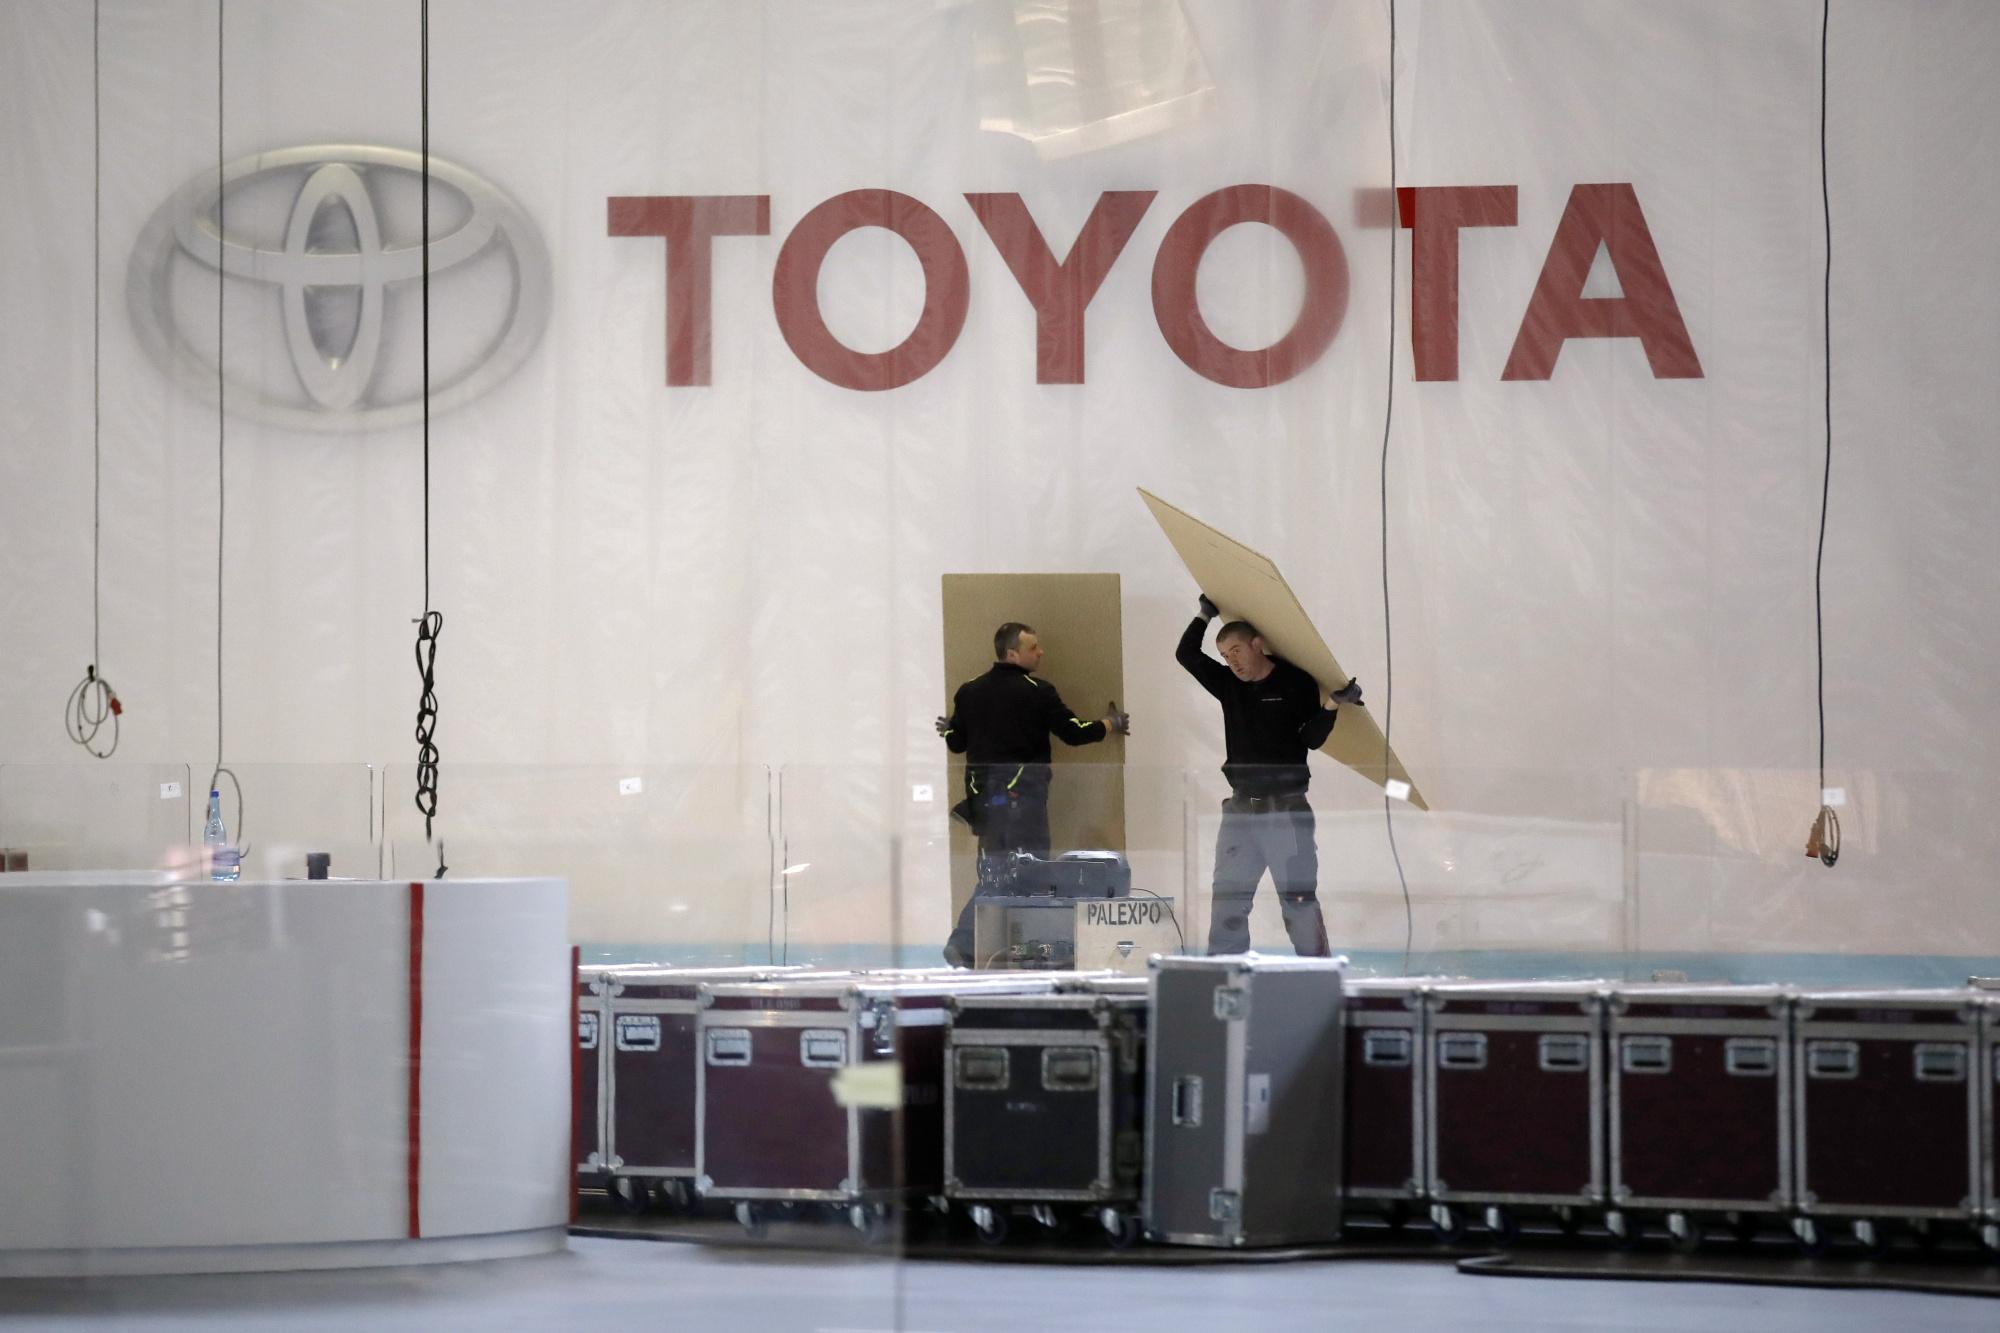 停止 トヨタ 生産